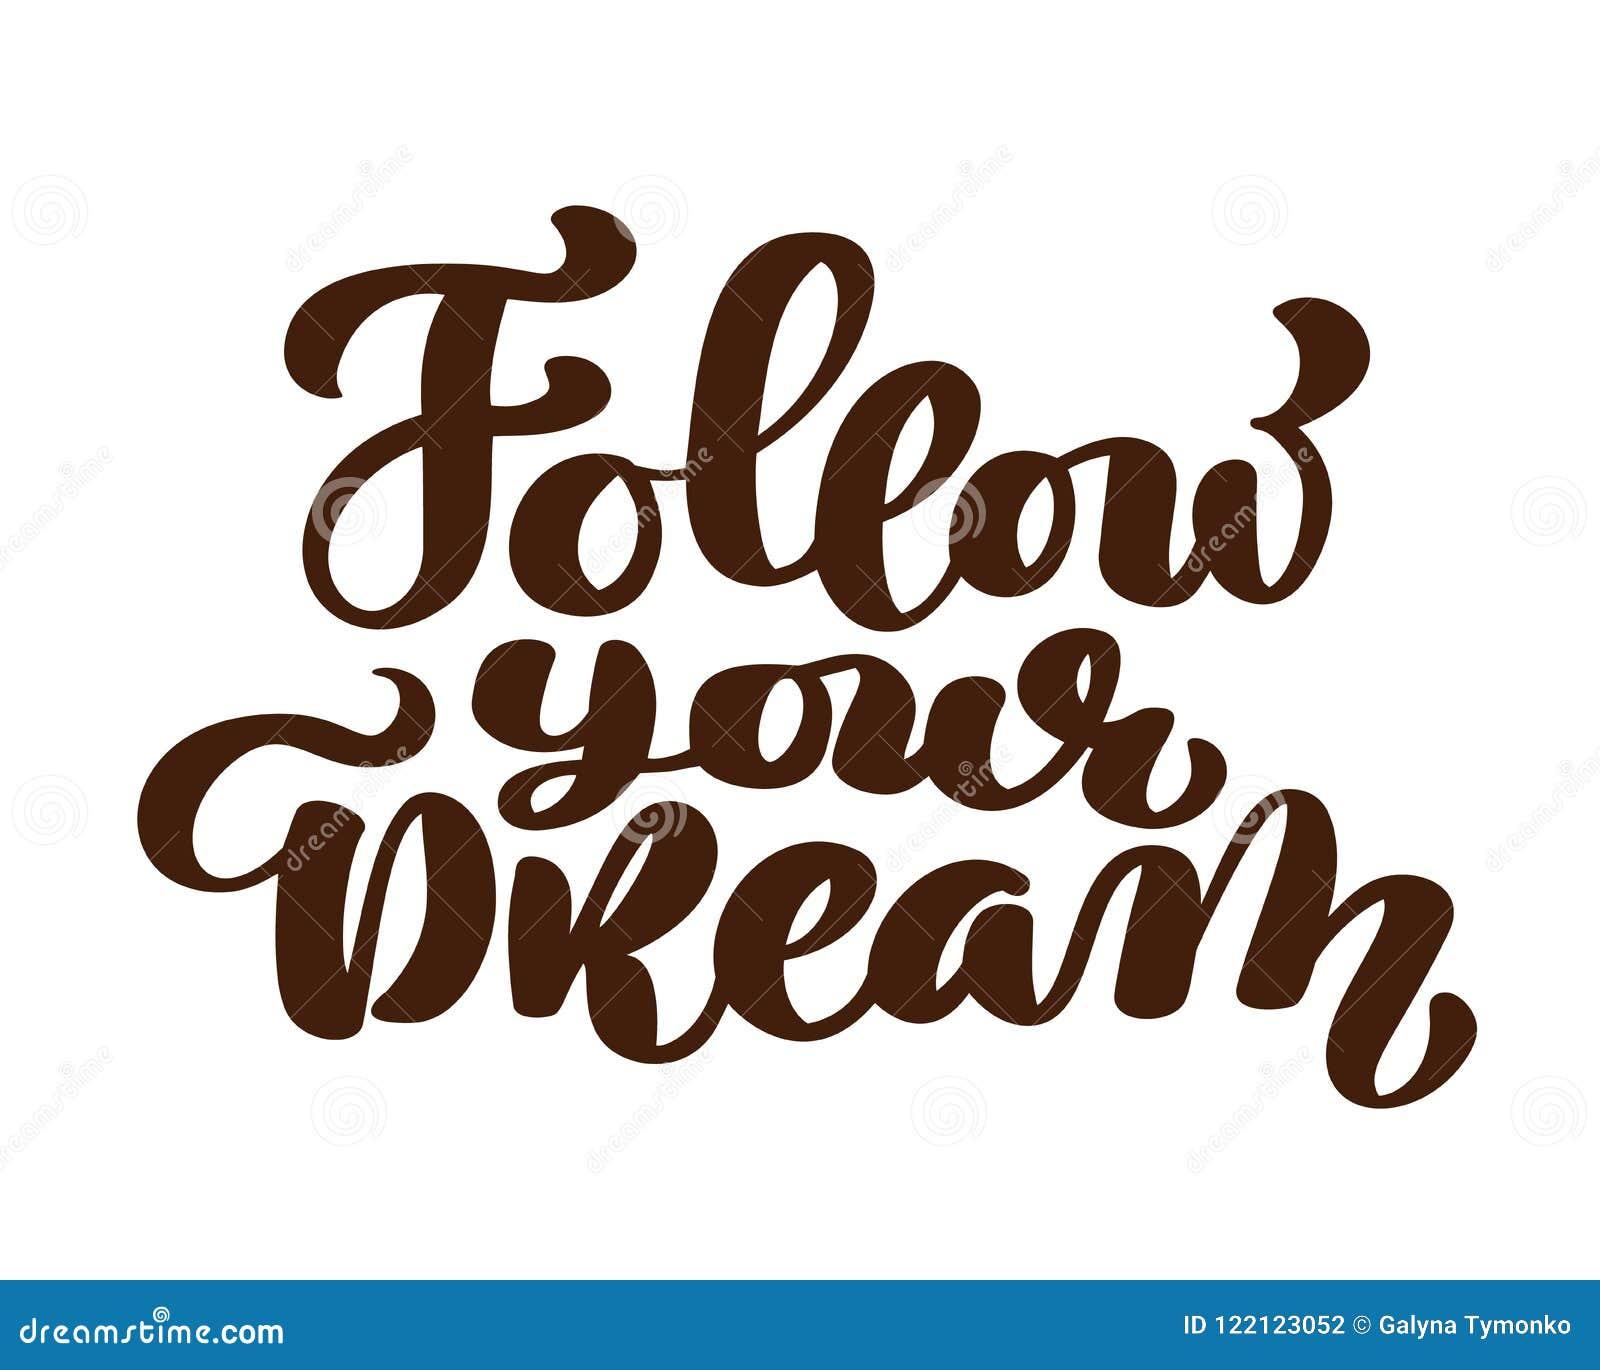 Follow Your Dreams Slogan Hand Written Lettering Modern Brush